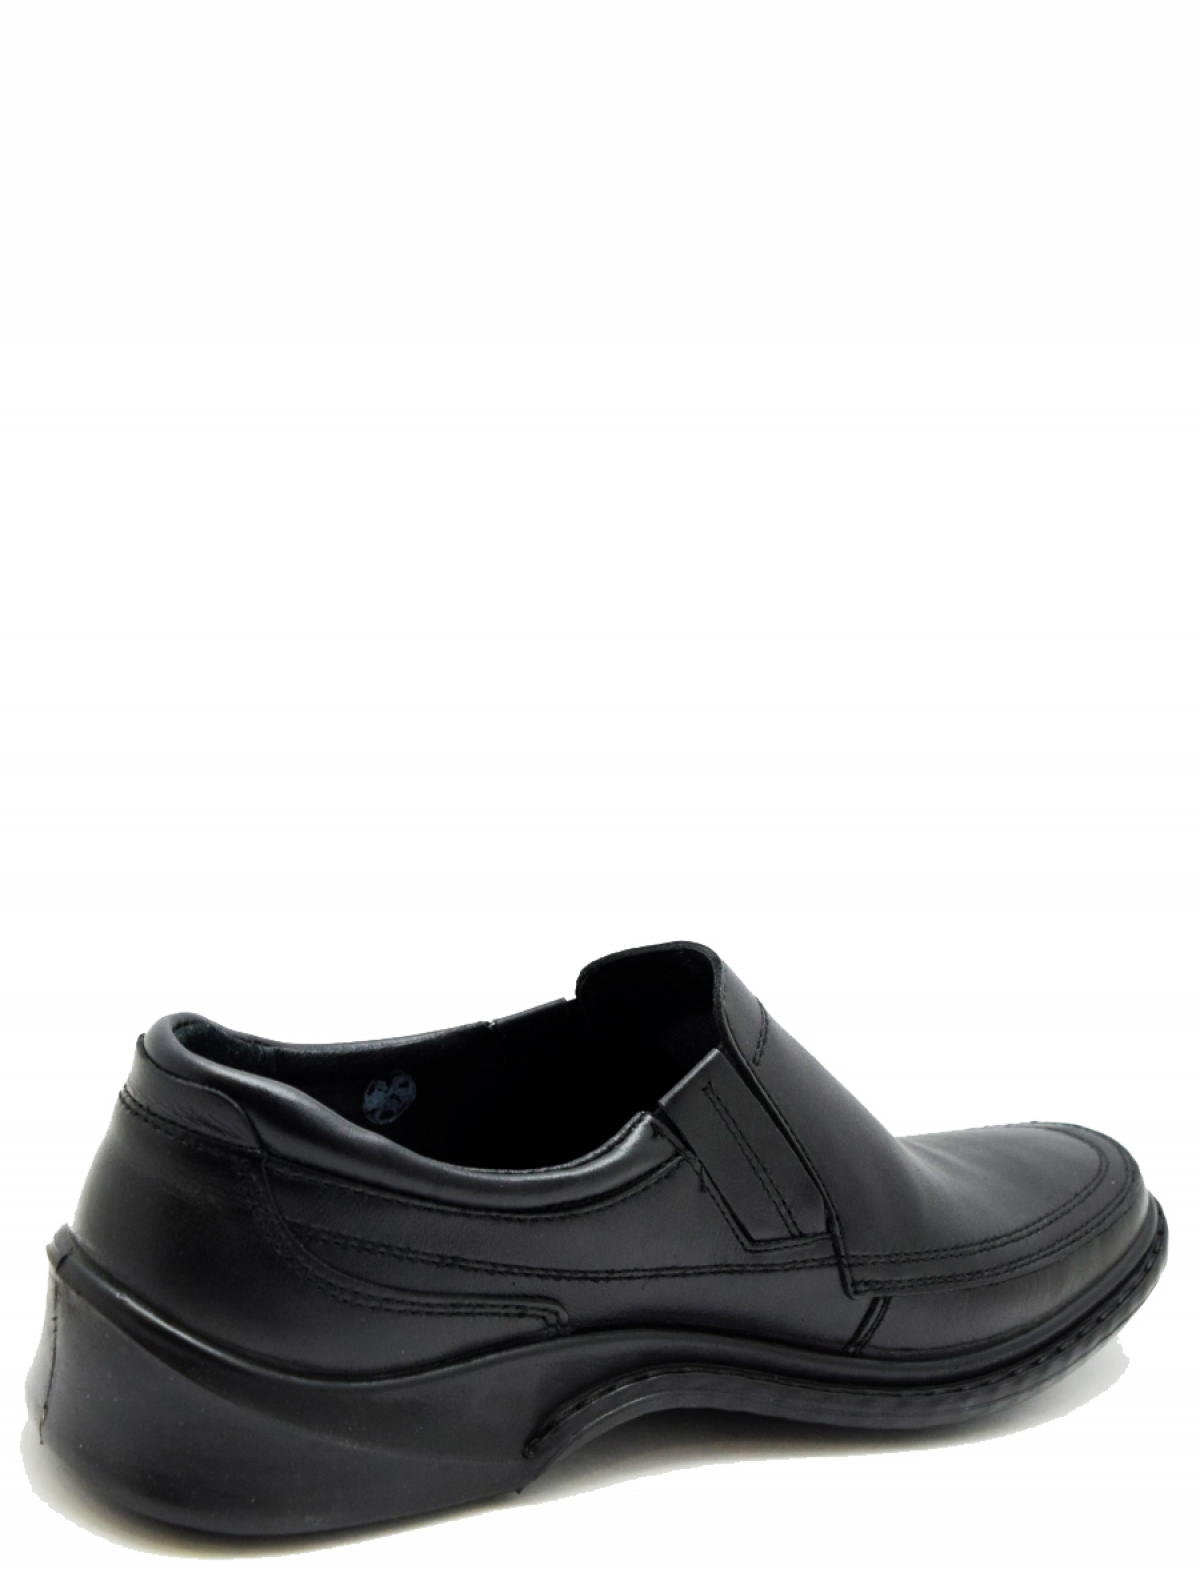 Marko 4739 мужские туфли